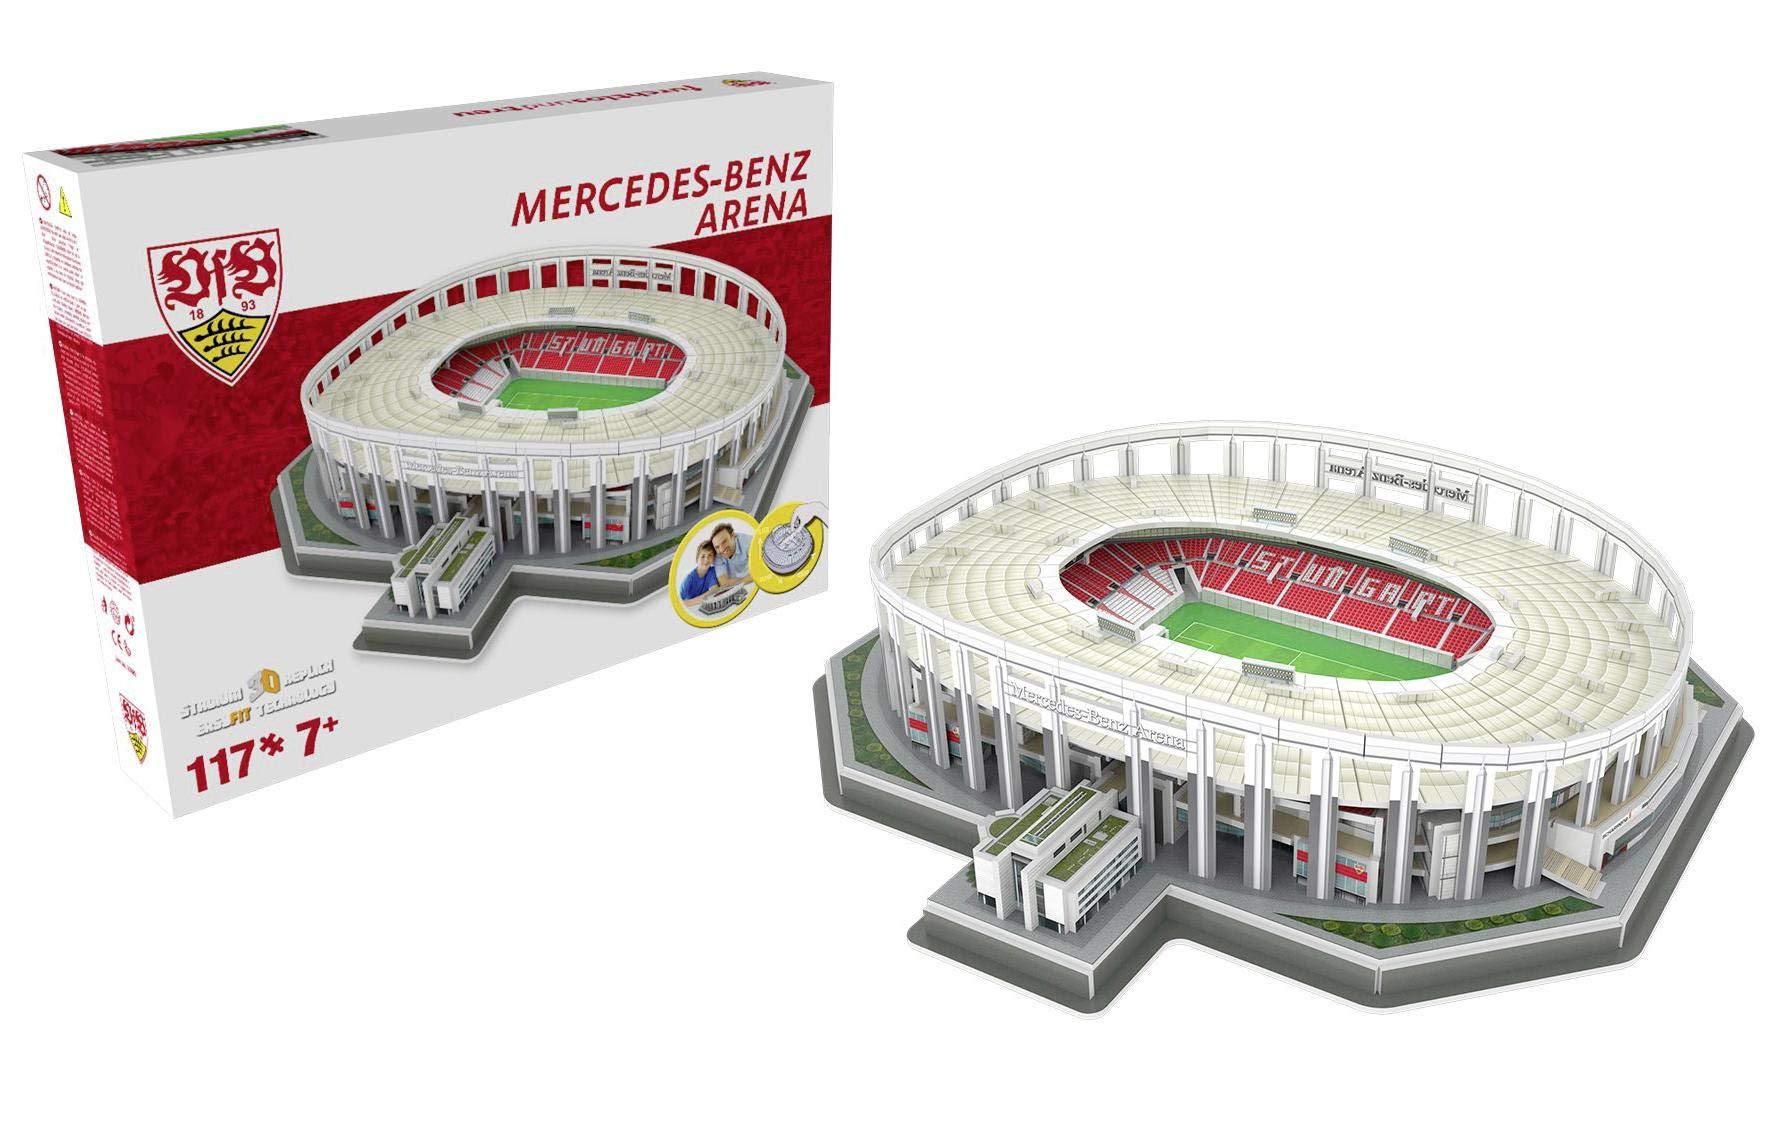 Nanostad Mercedes Benz Arena 3D Puzzle VFB Stuttgart 117 Pieces Plastic & Cardboard Gift Boxed